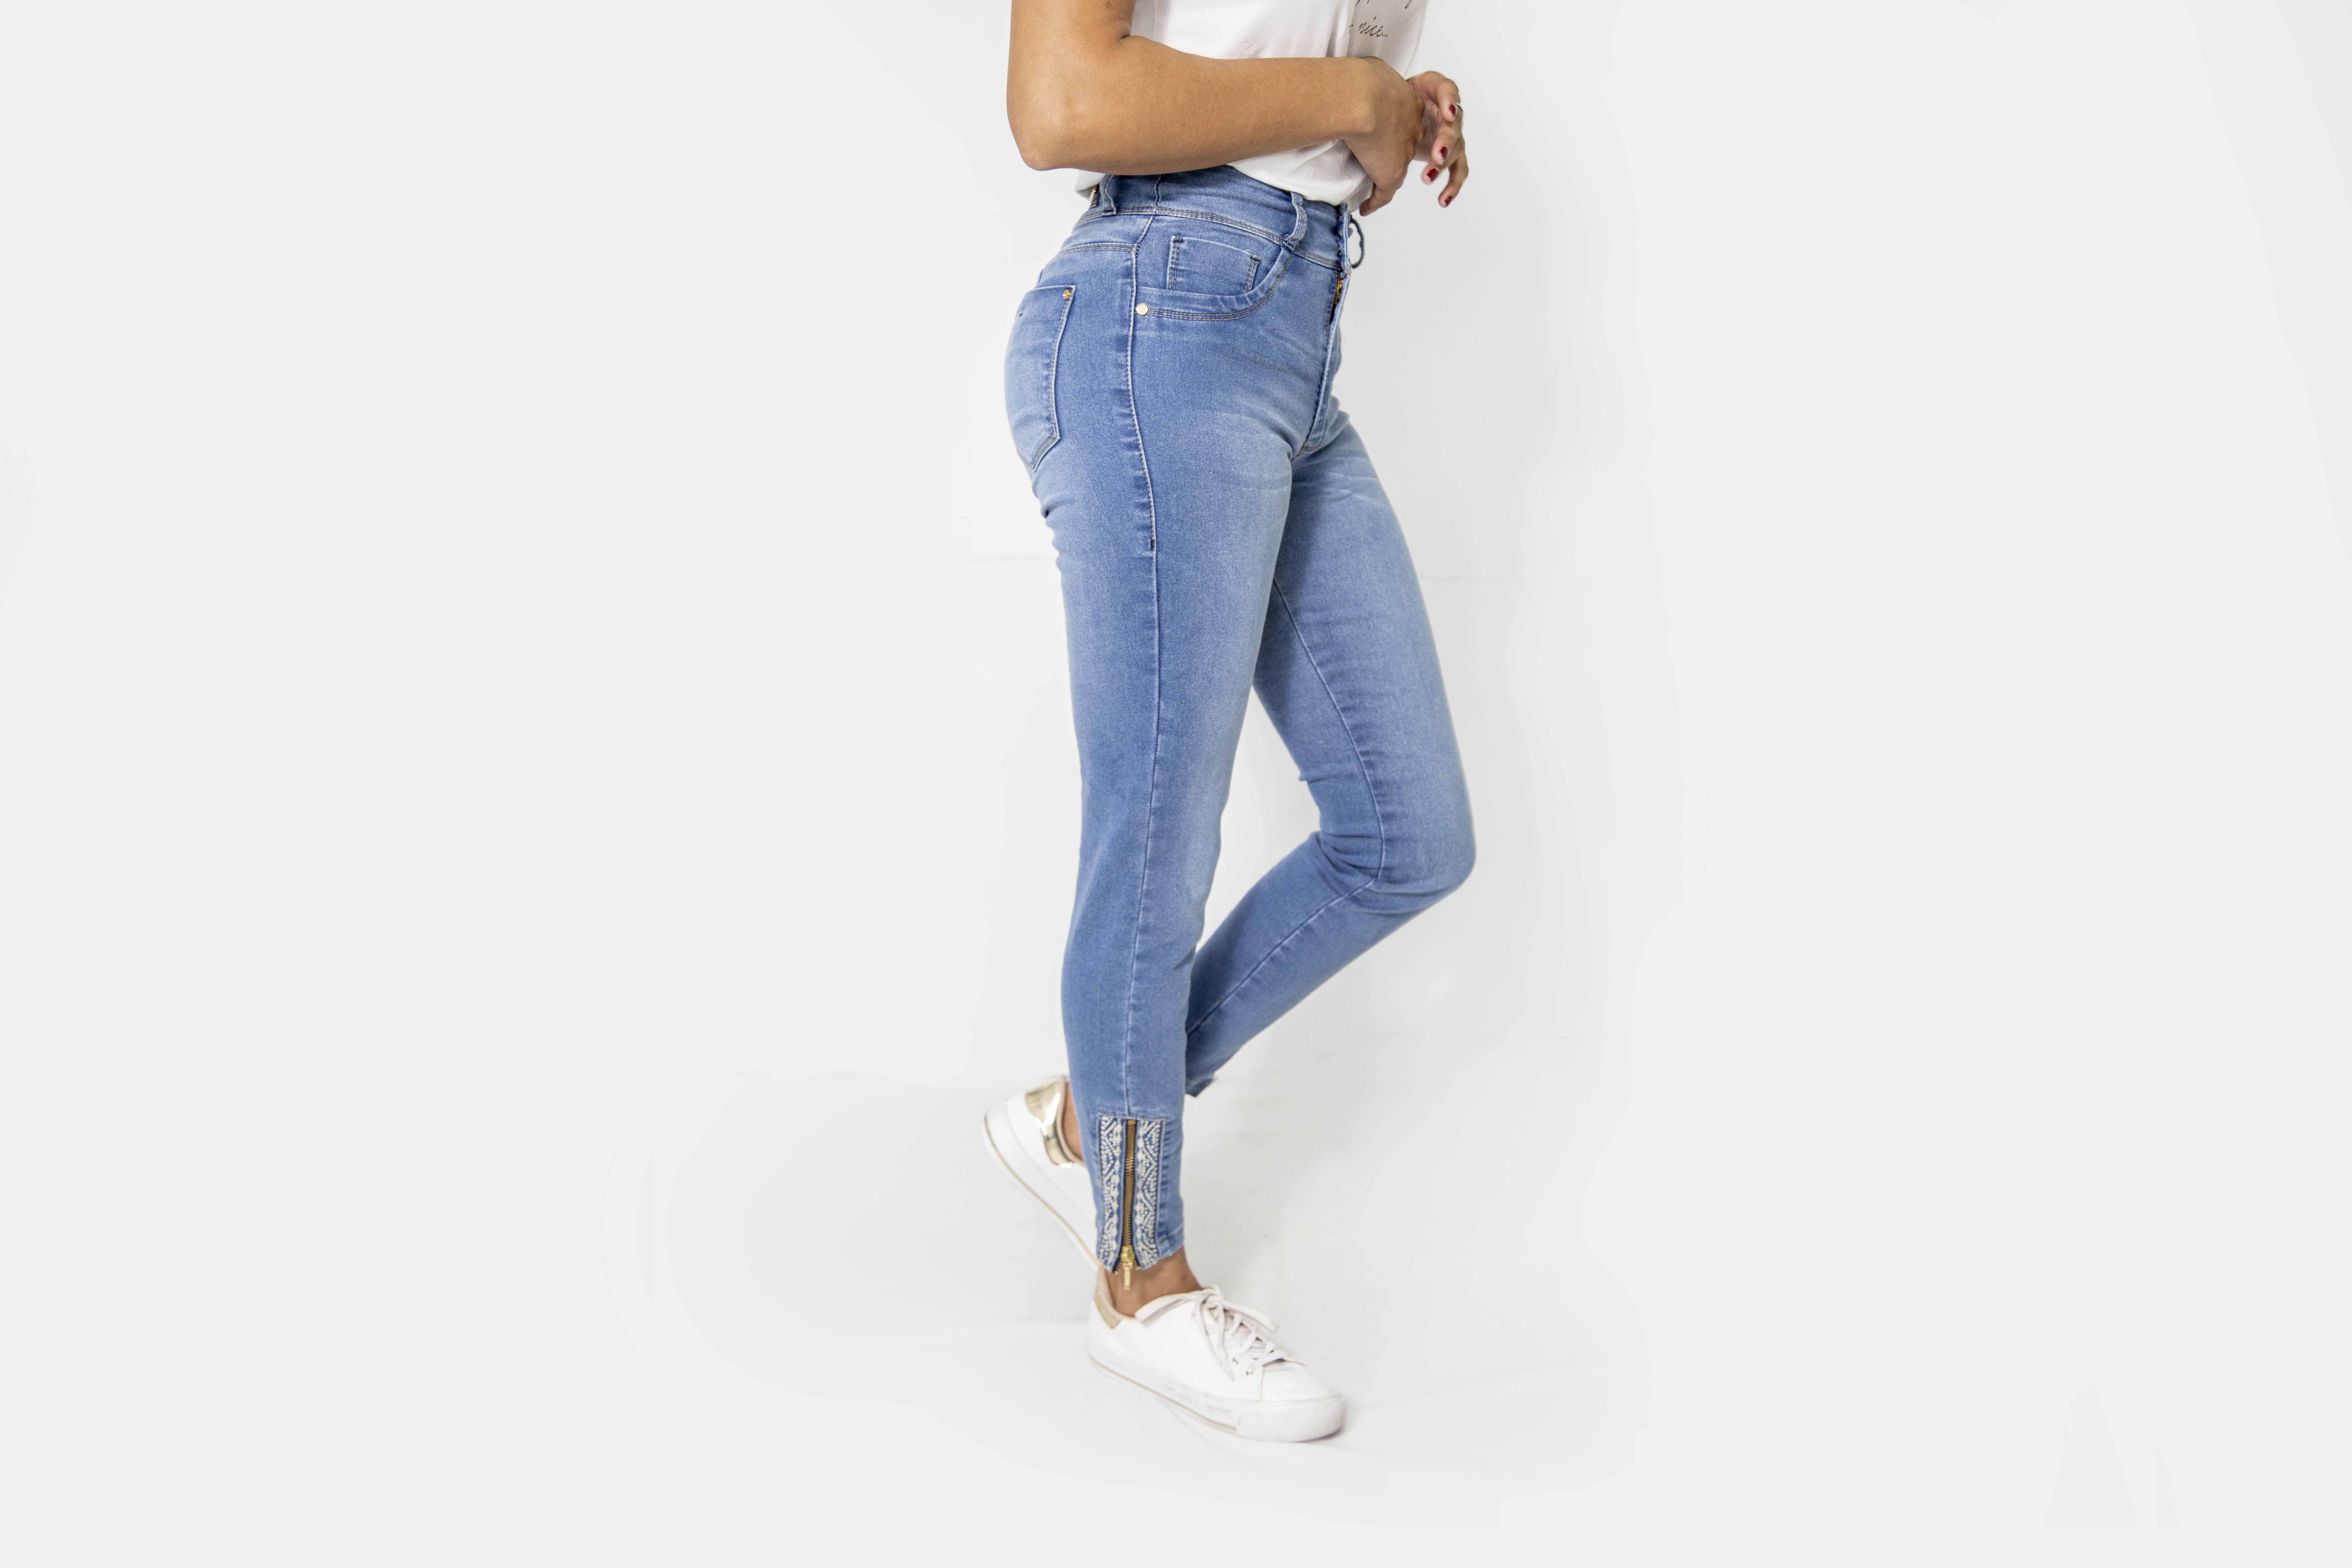 Cropped Dama Jeans Elast. Cod. 1190536